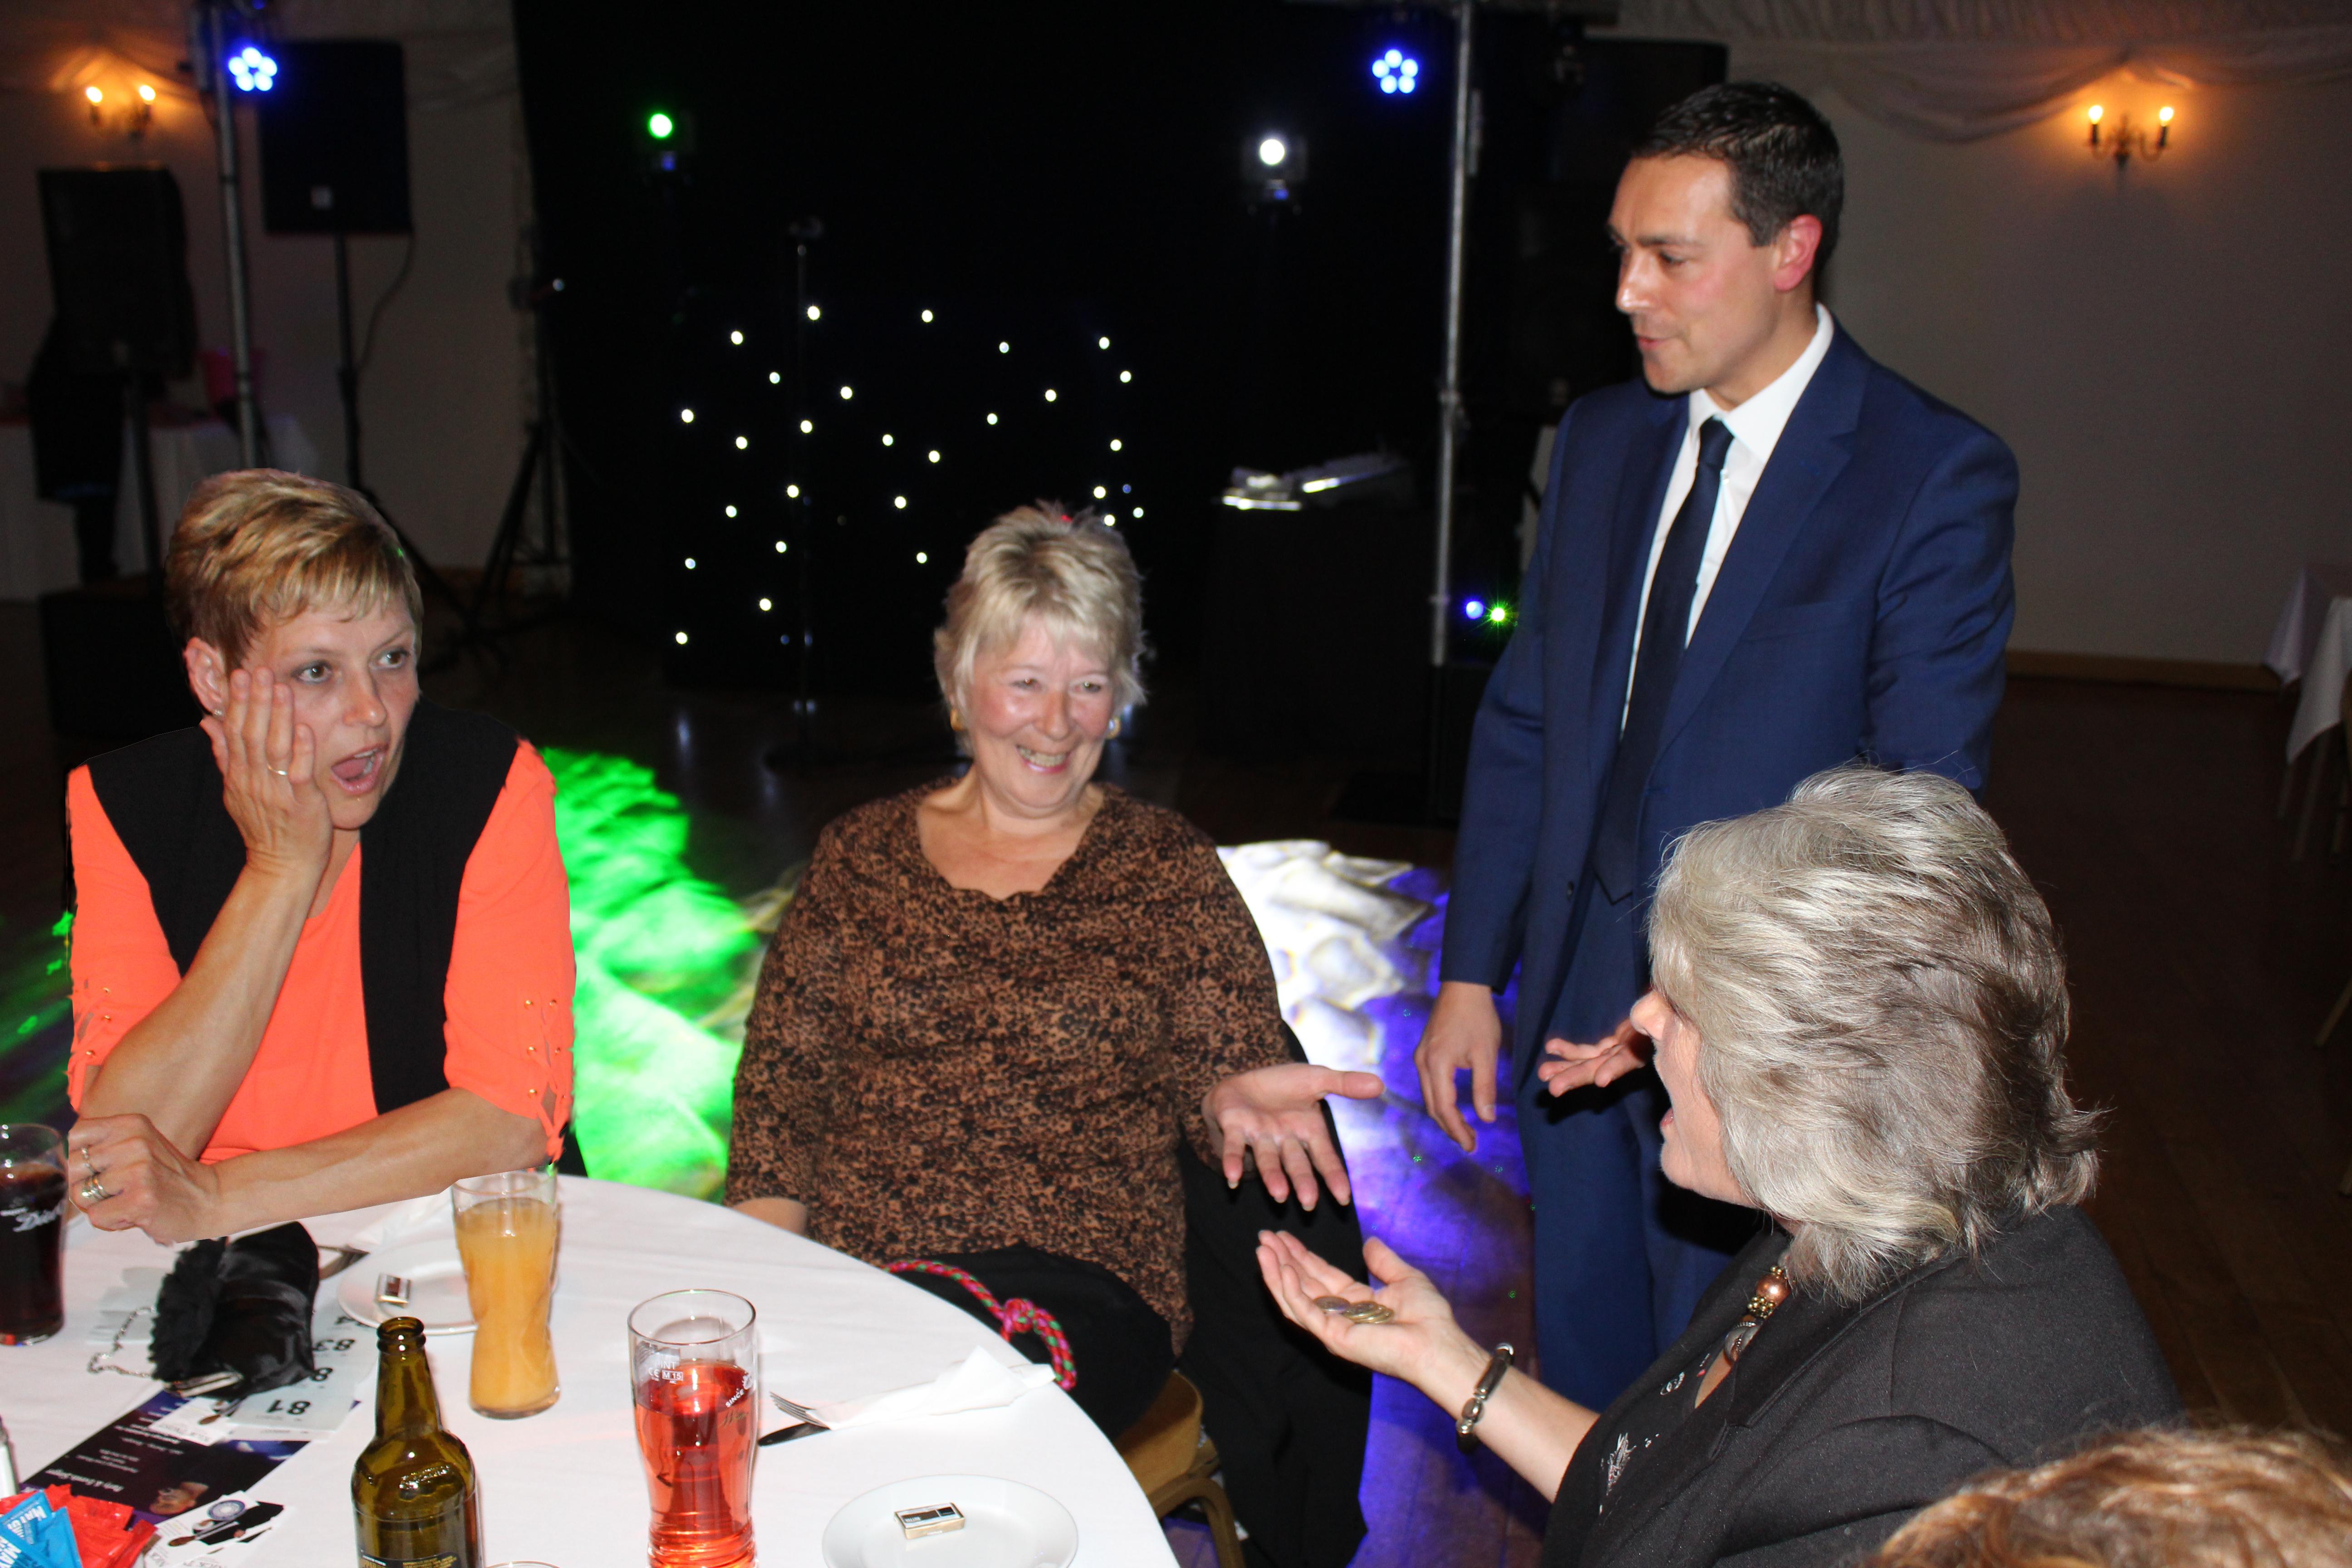 Nick Twist amazing some wonen at a wedding: Norfolk based magician